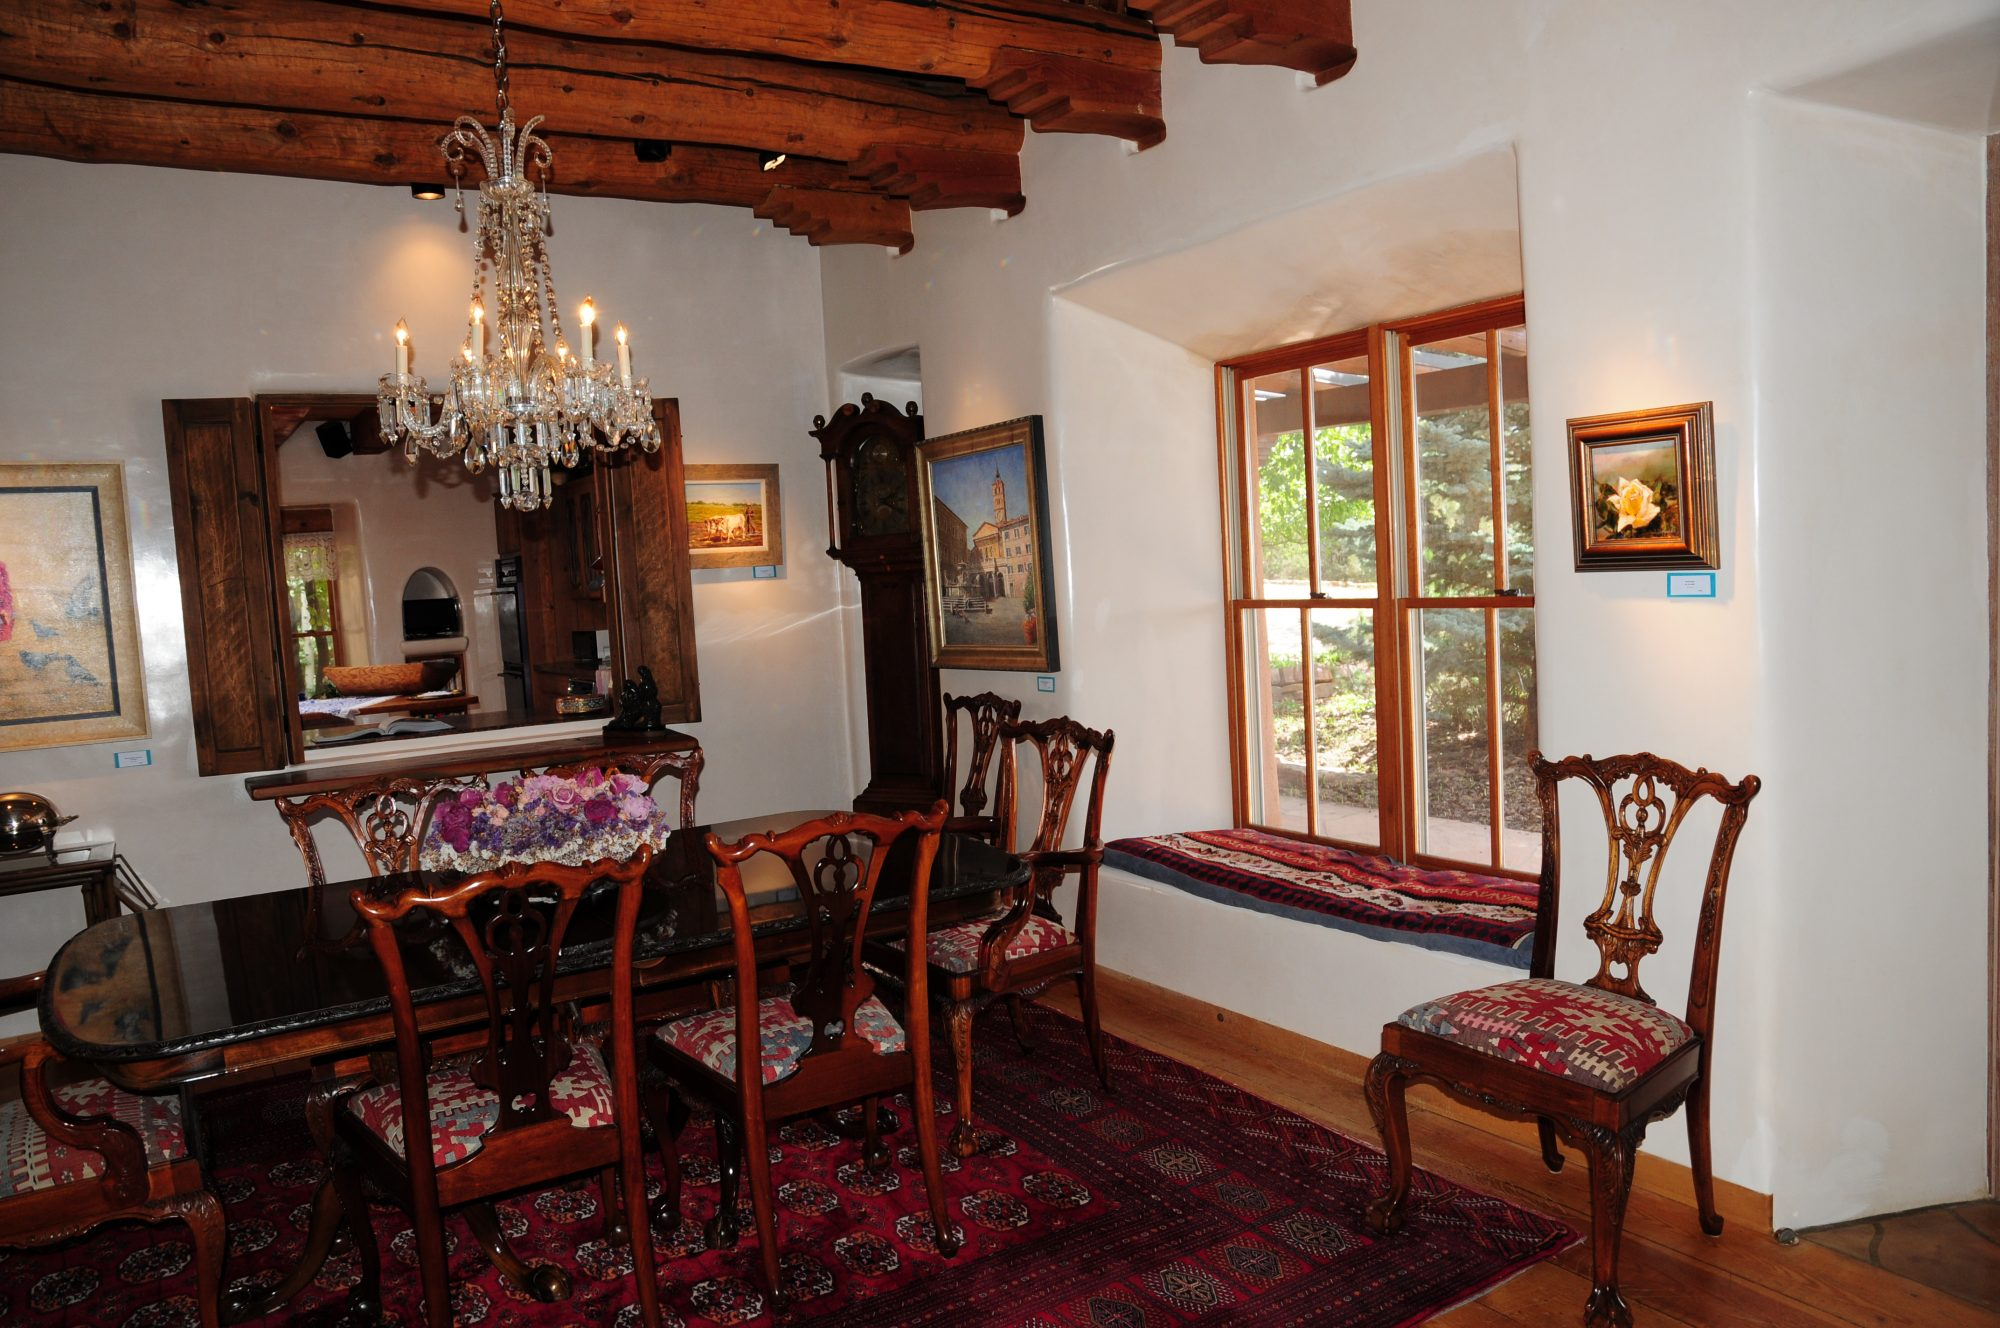 10 SHERWOOD INTERIOR - DINING ROOM